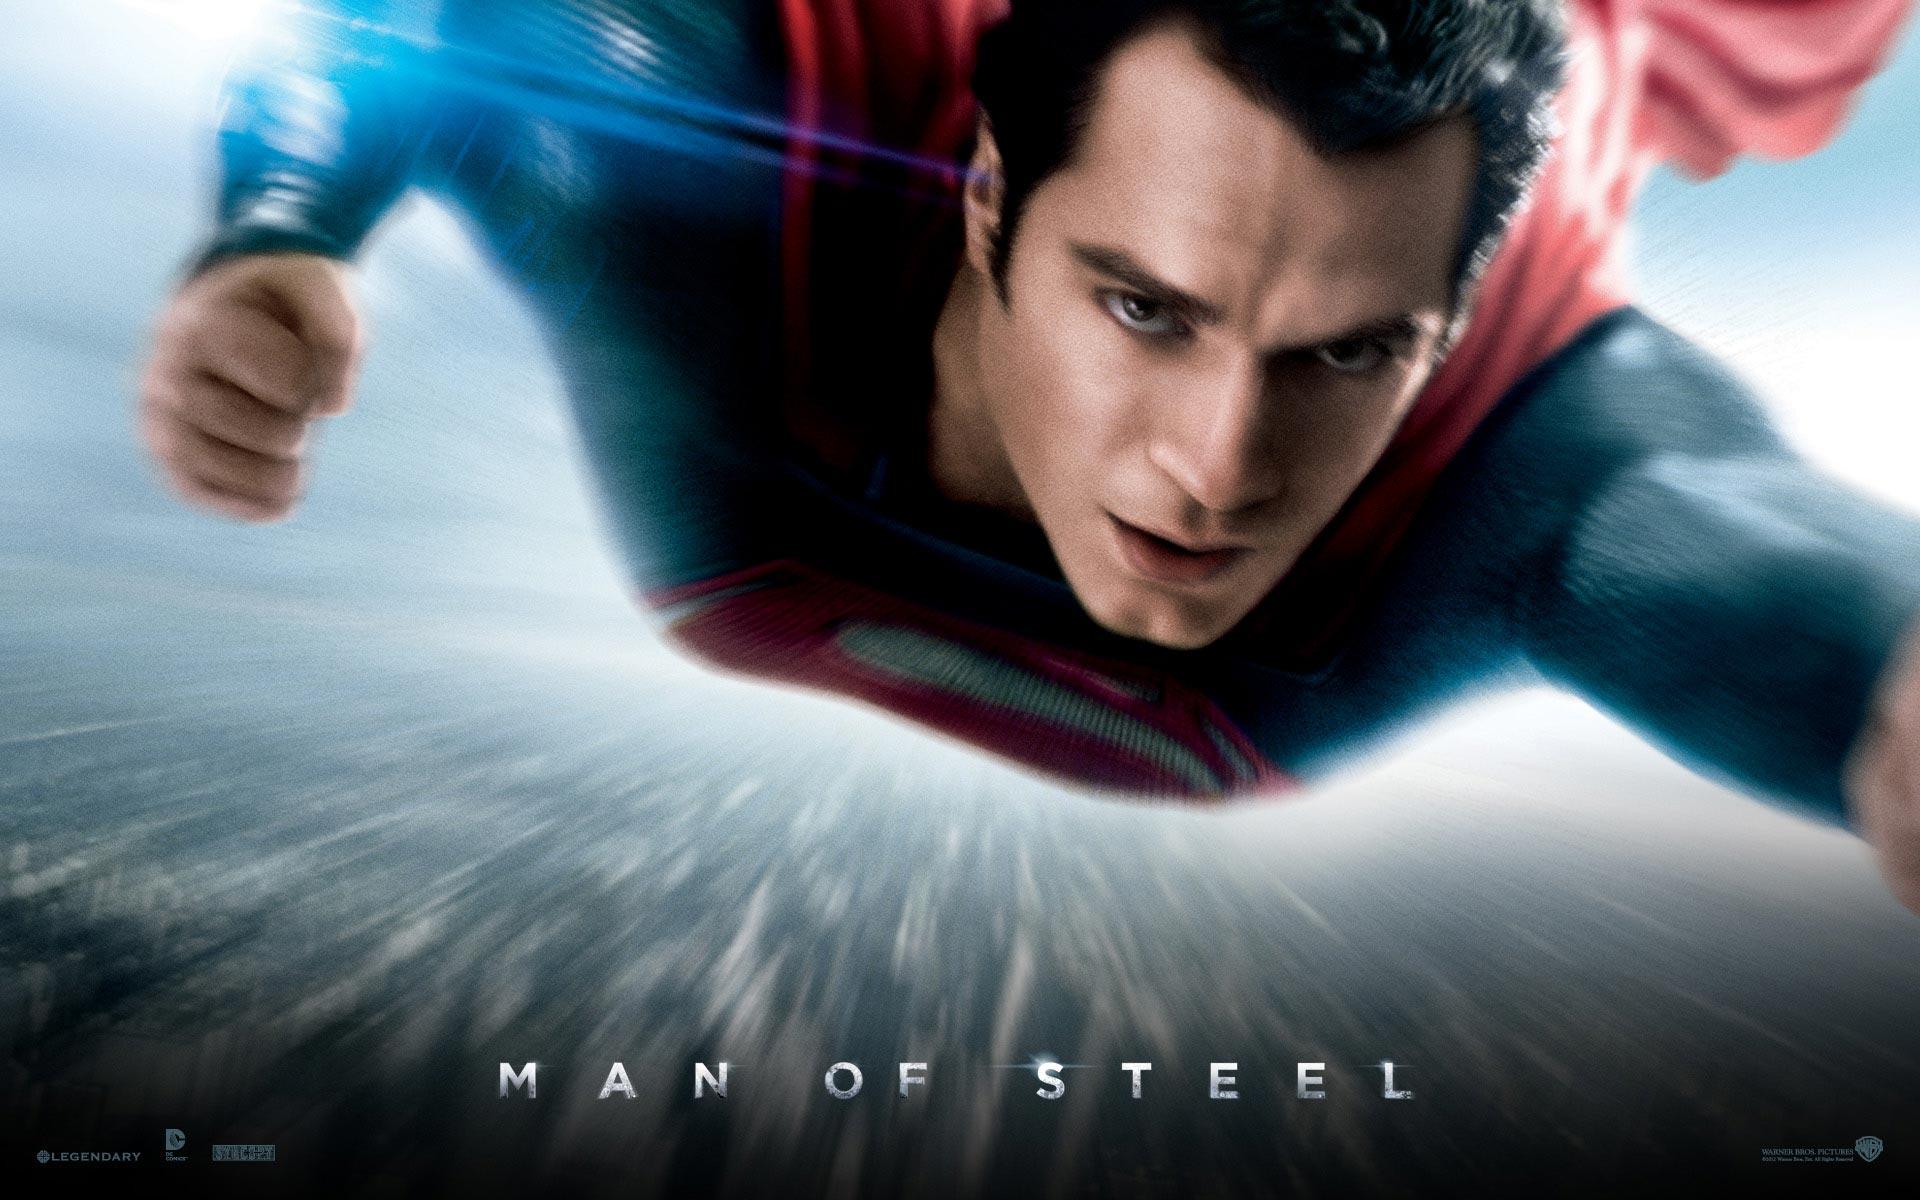 http://www.filmofilia.com/wp-content/uploads/2013/05/Man-of-Steel_01.jpg